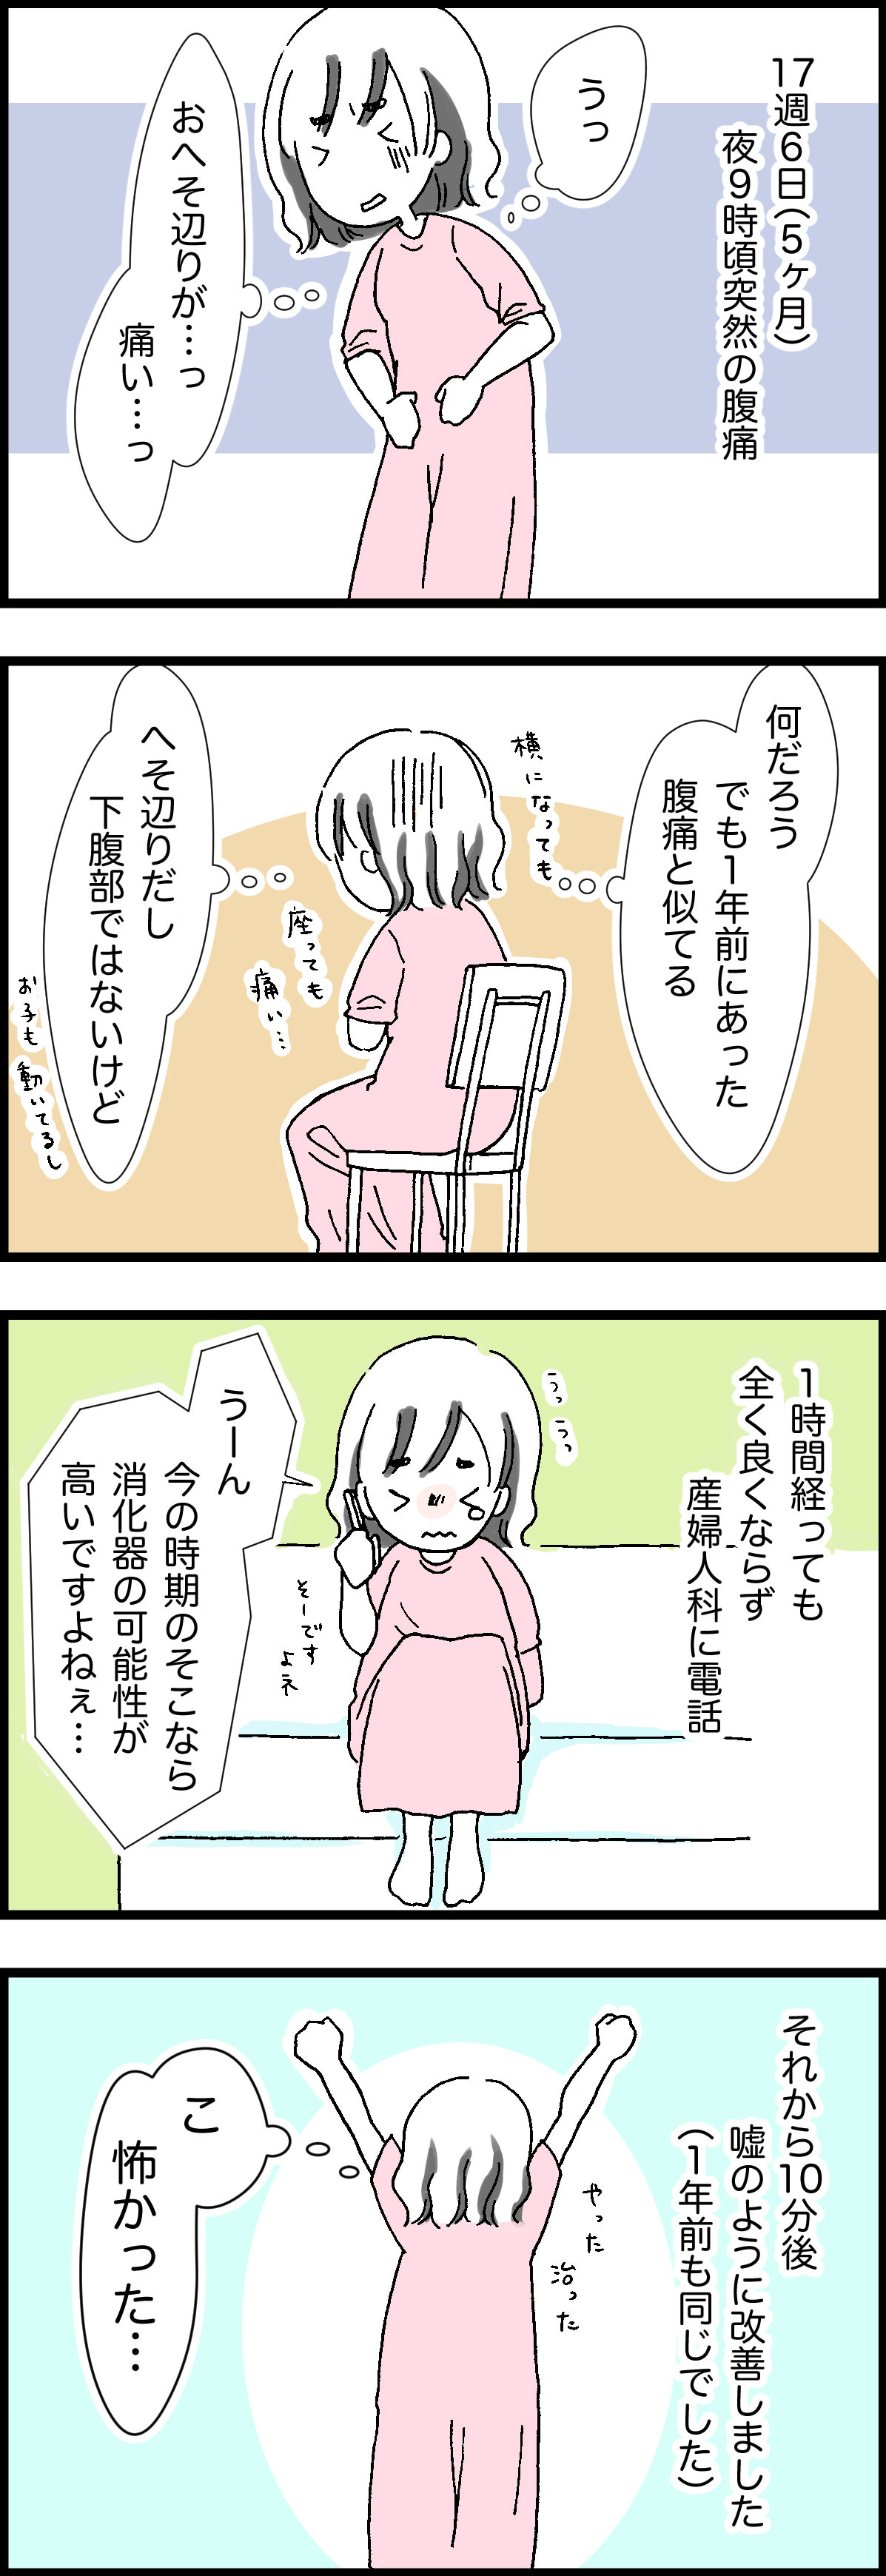 ヶ月 妊娠 腹痛 5